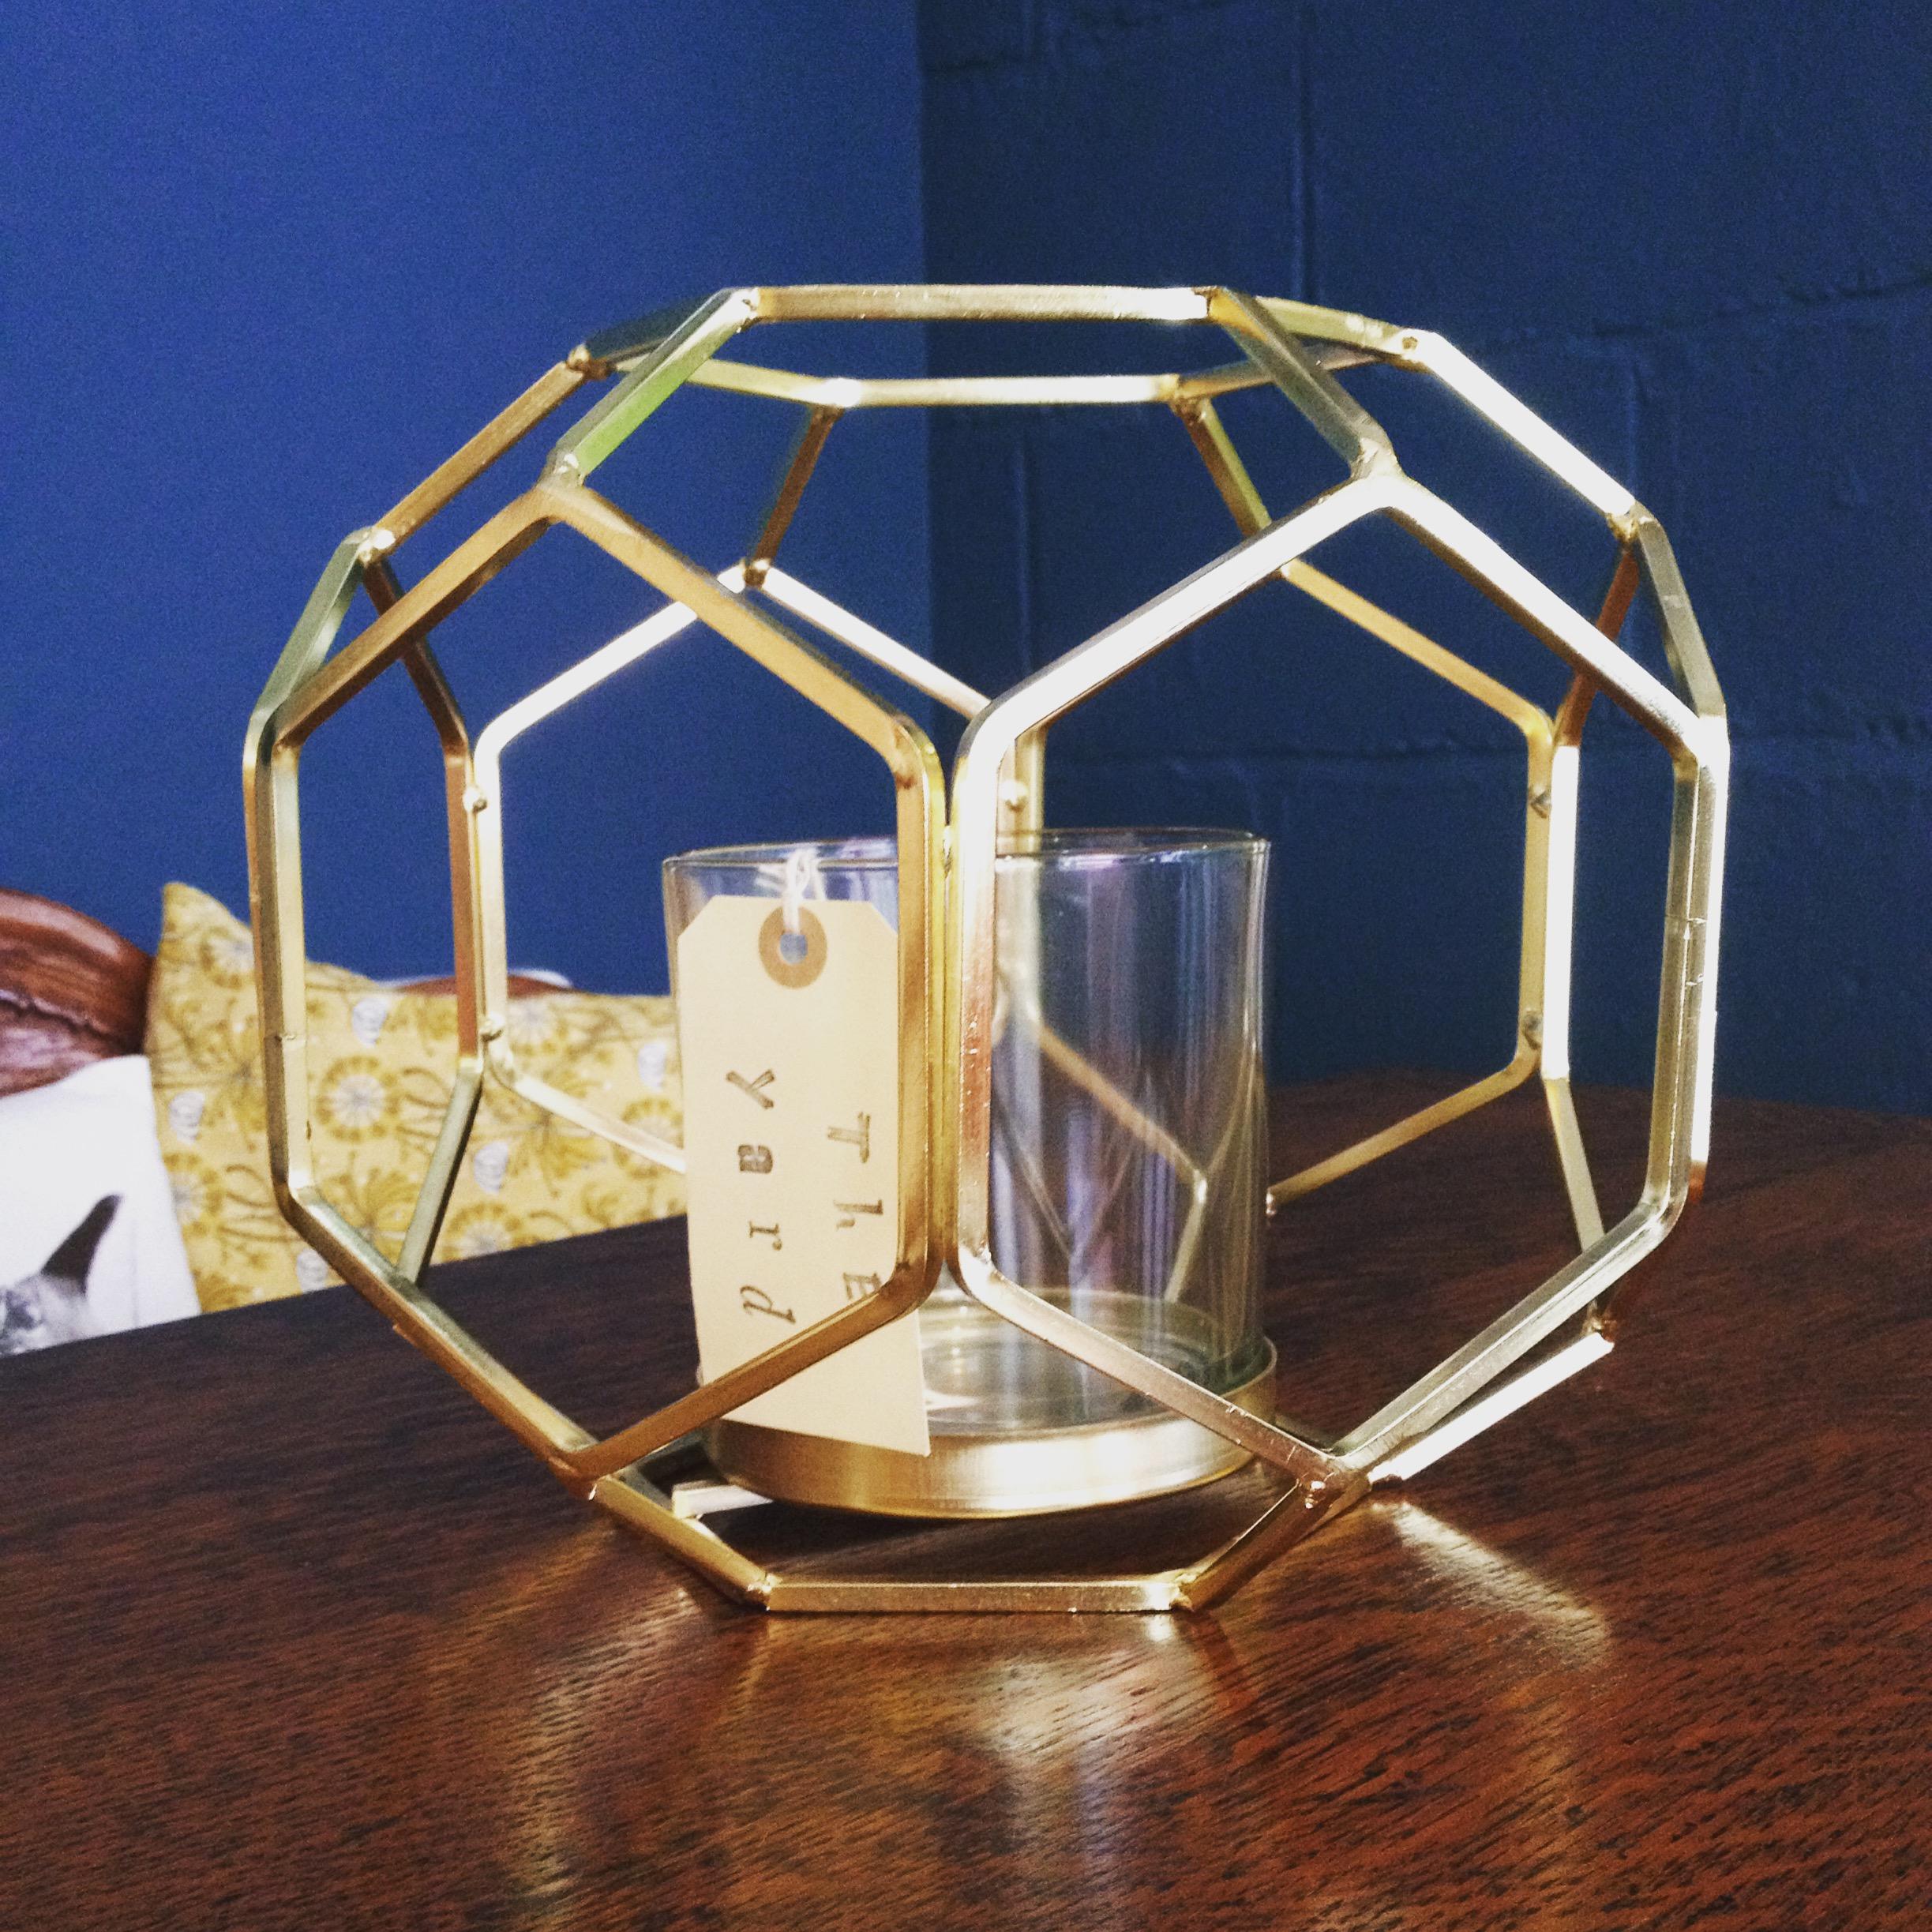 Hexagonal gold and glass lantern